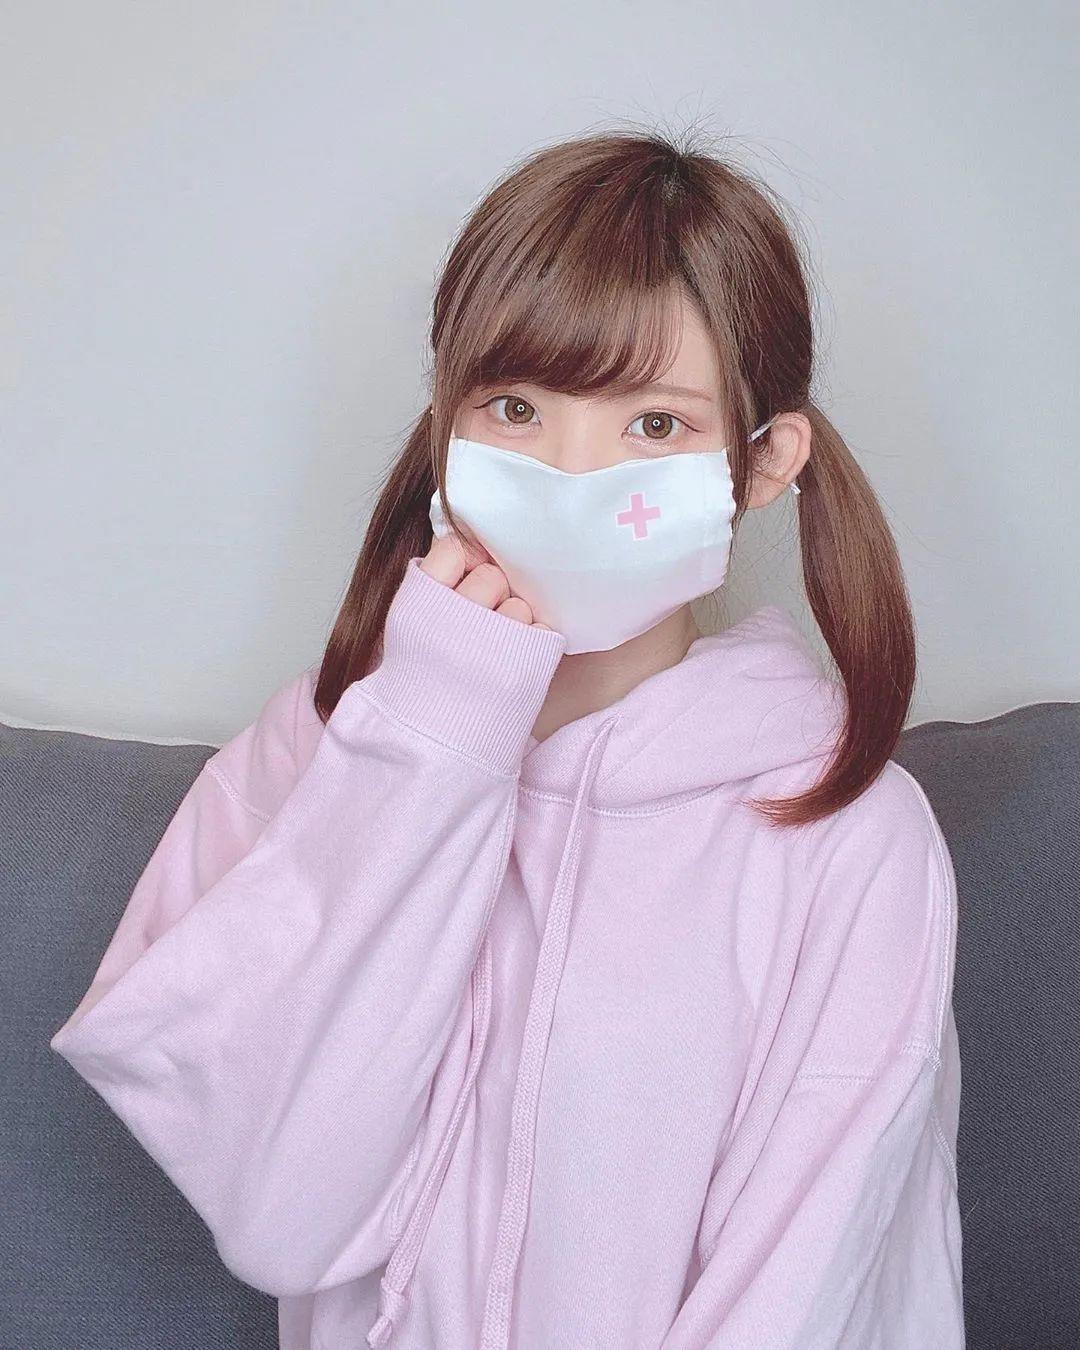 日本第一coser(Enako) Instagram:enakorin日常照及coser照_图片 No.6